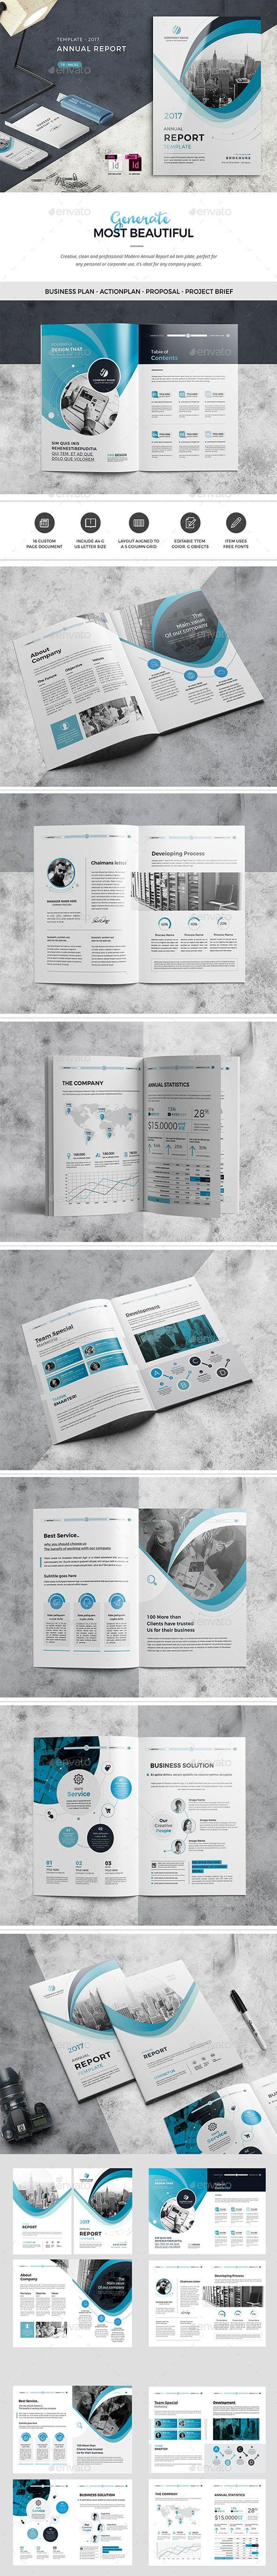 Annual Report Template - Corporate Brochures